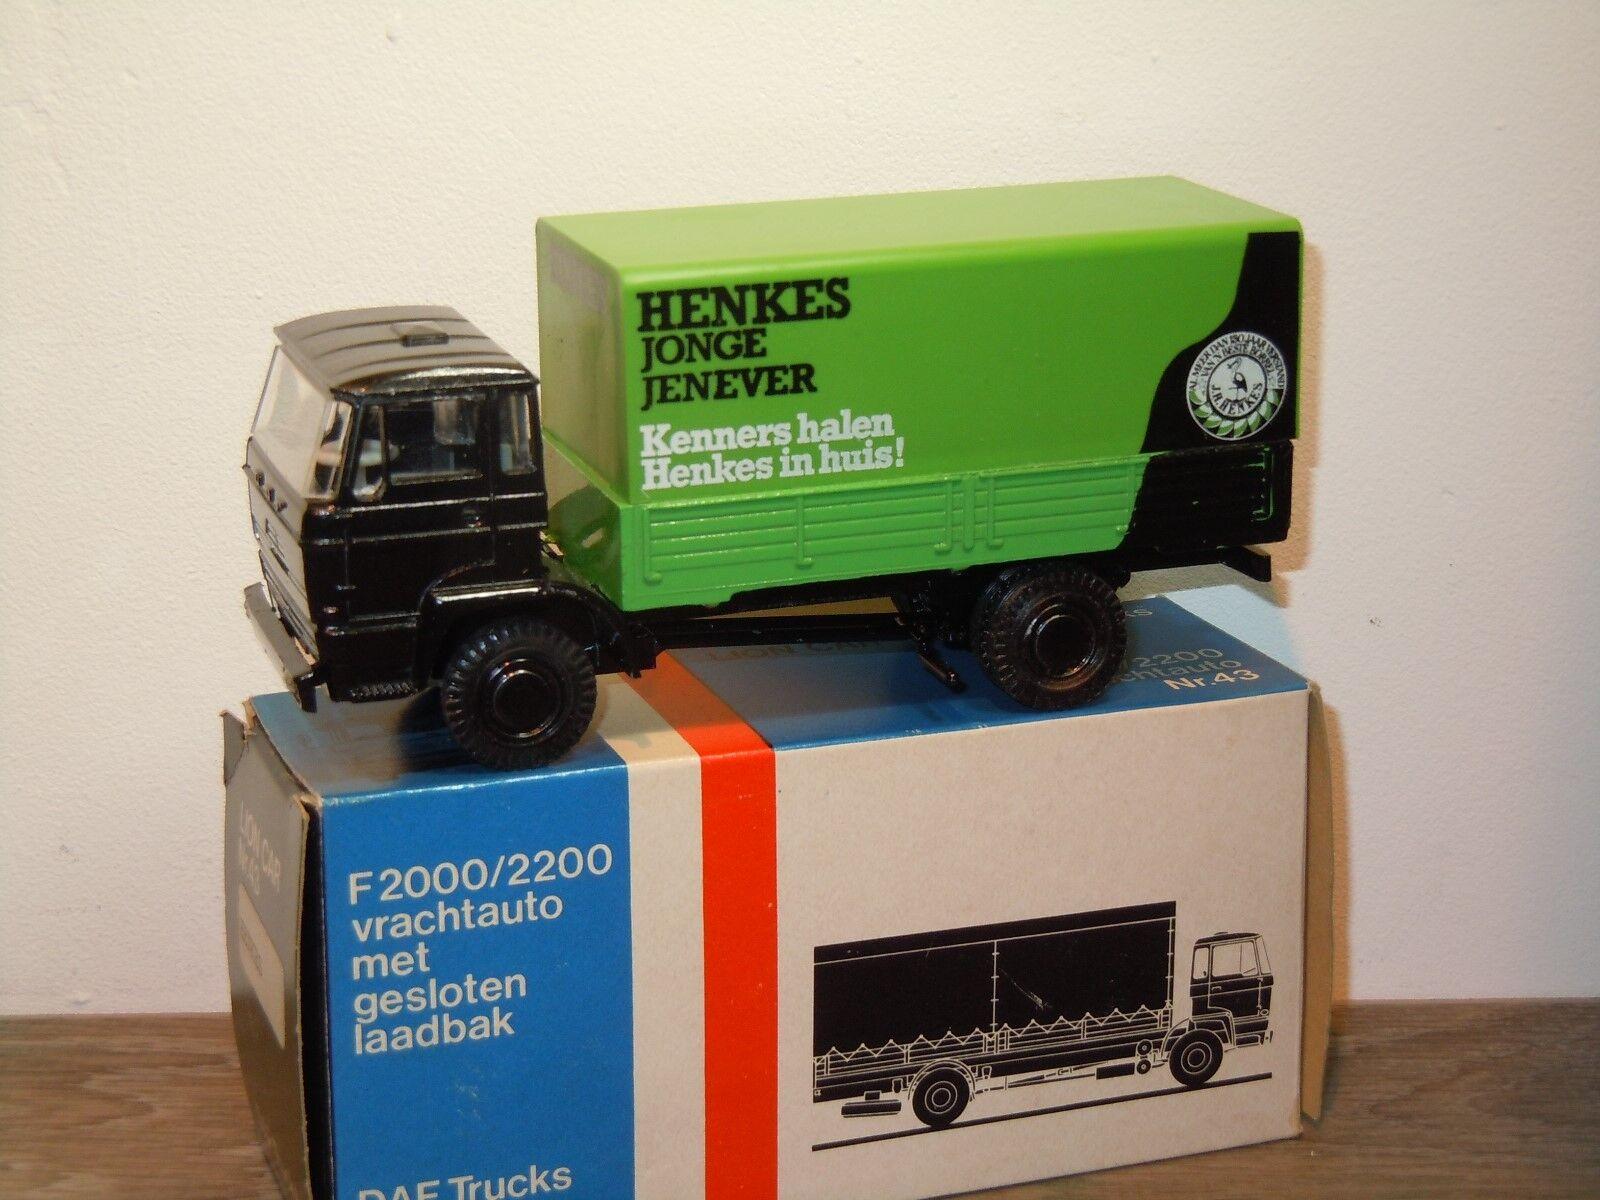 Daf F2000   2200 Henkes Jonge Jenever - Lion Coche 43 Holland 1 50 in Box 34974